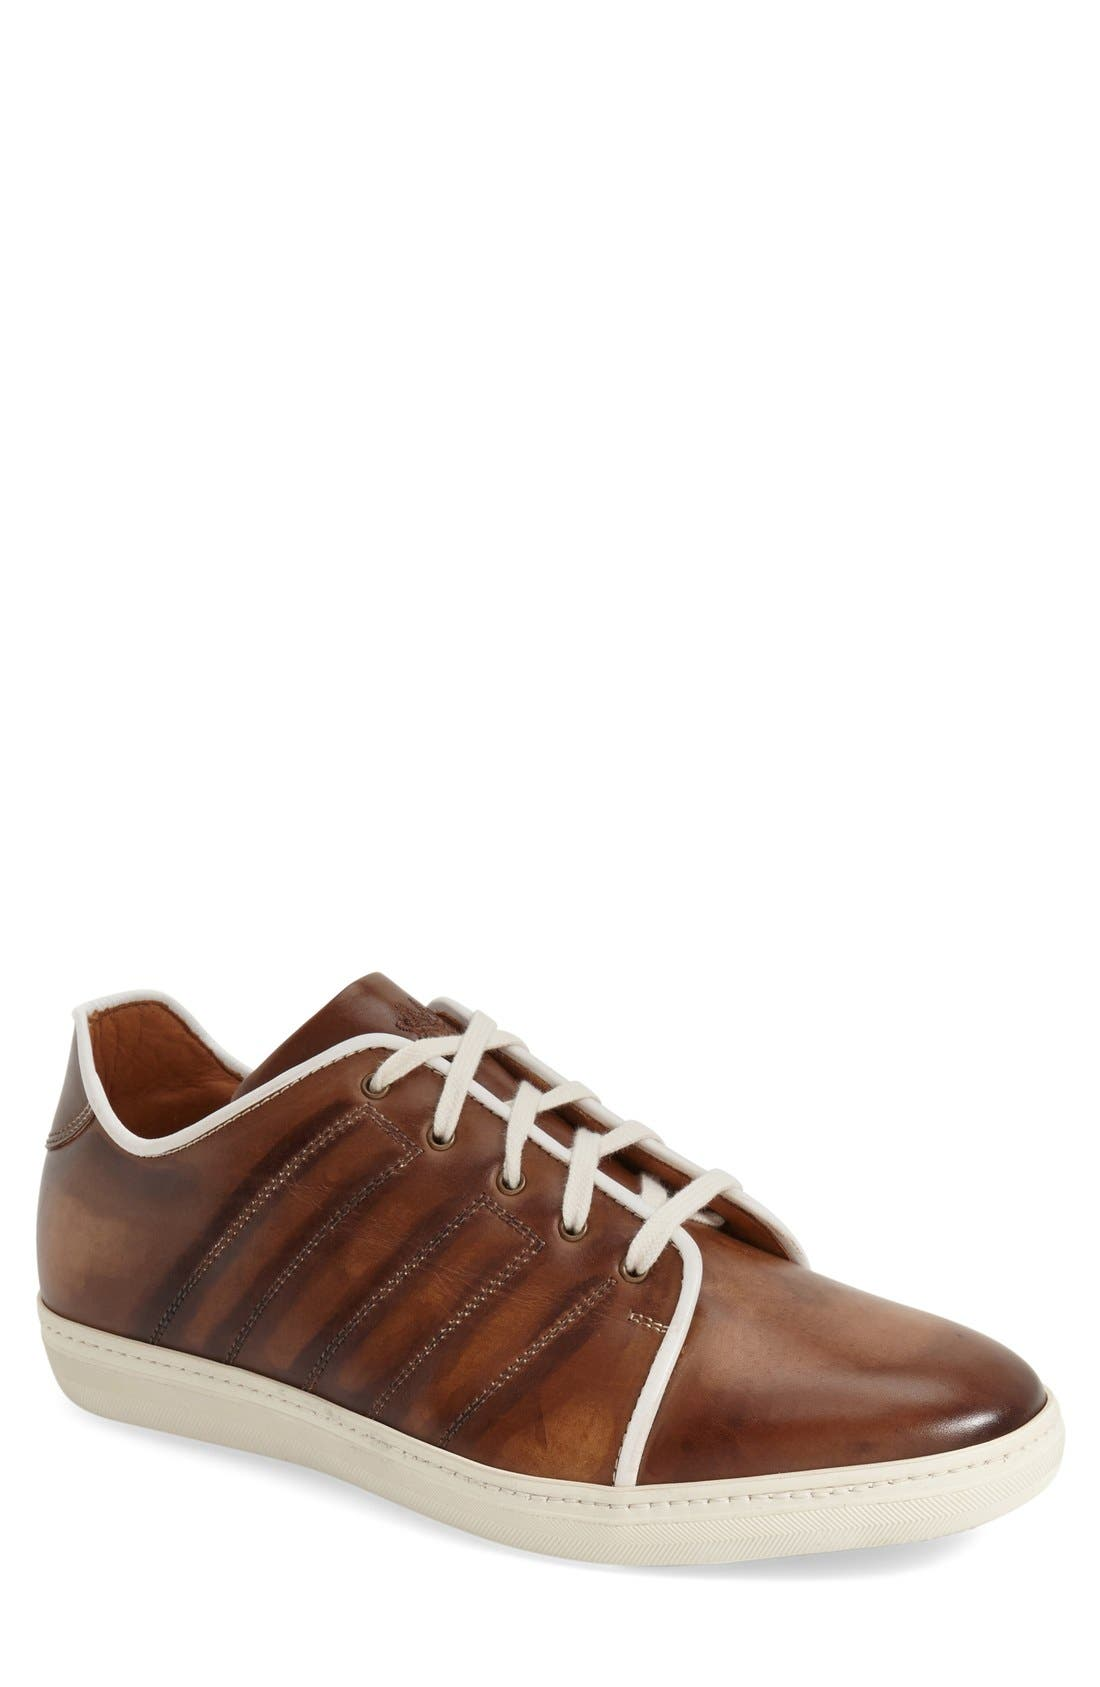 MEZLAN Balboa Sneaker